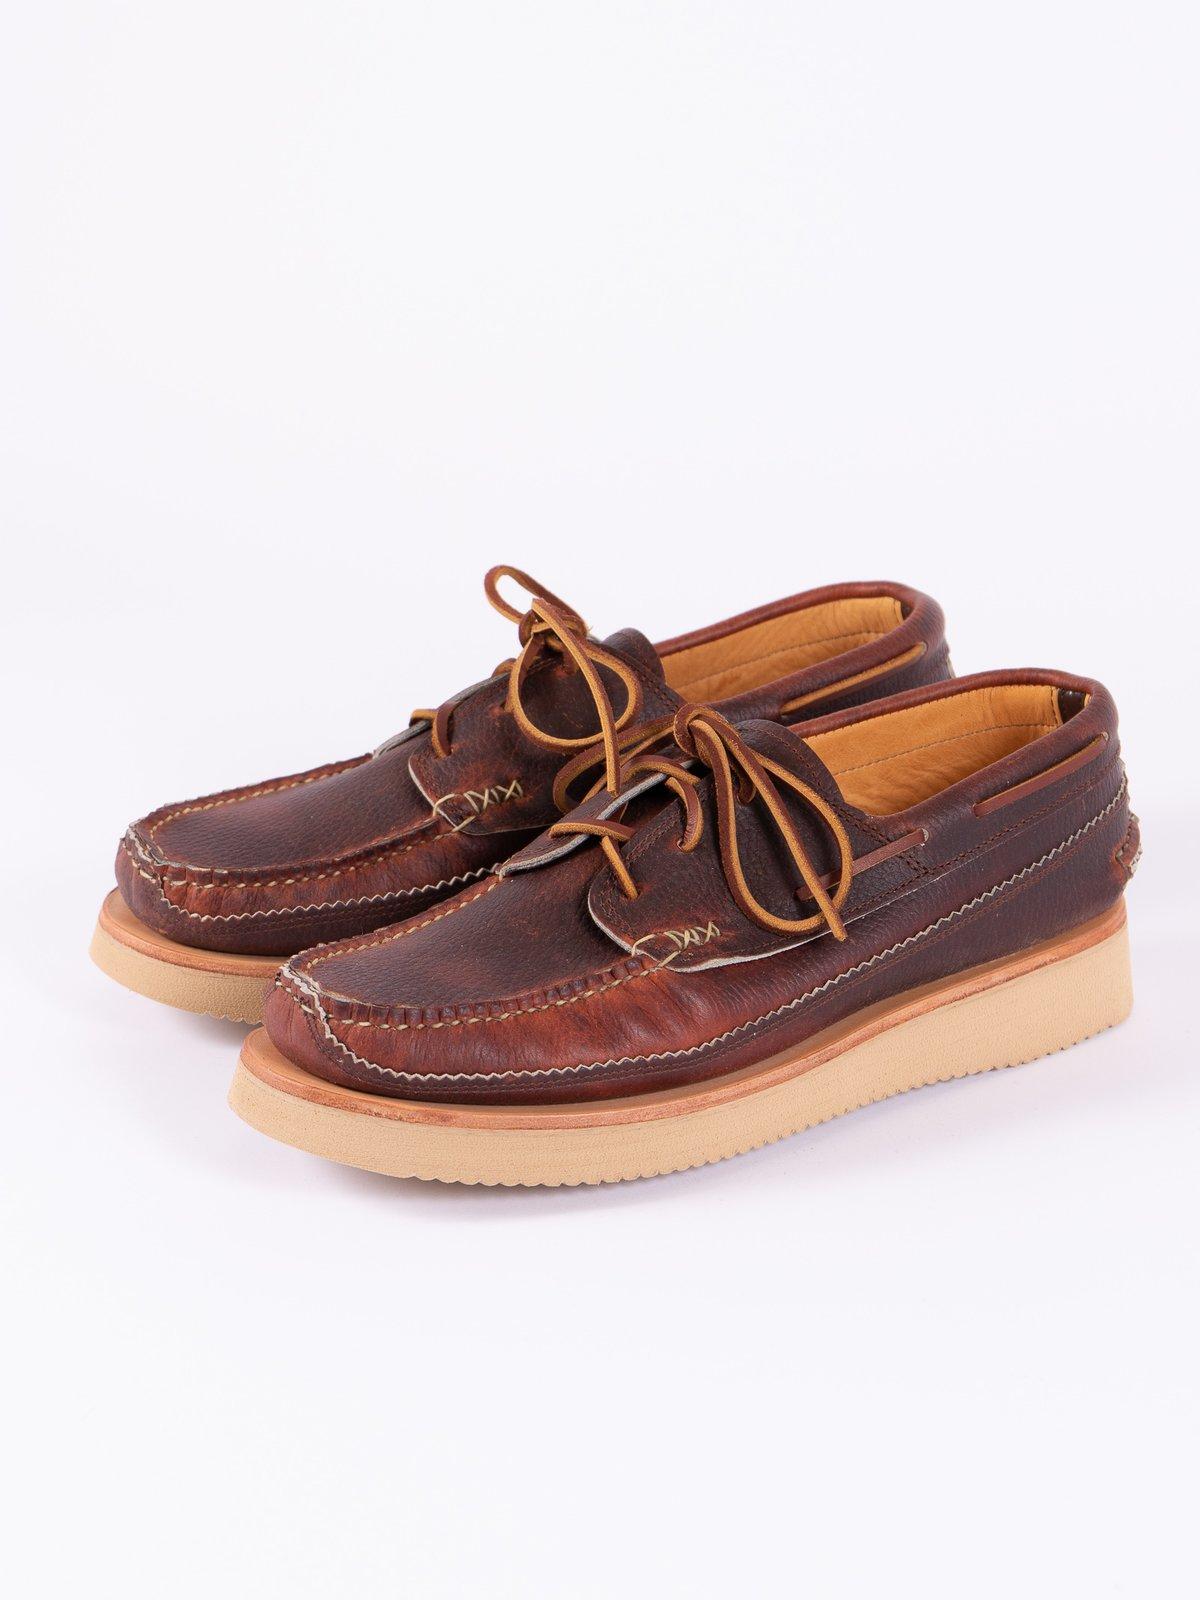 Chromepak Brown Boat Shoe Exclusive - Image 2